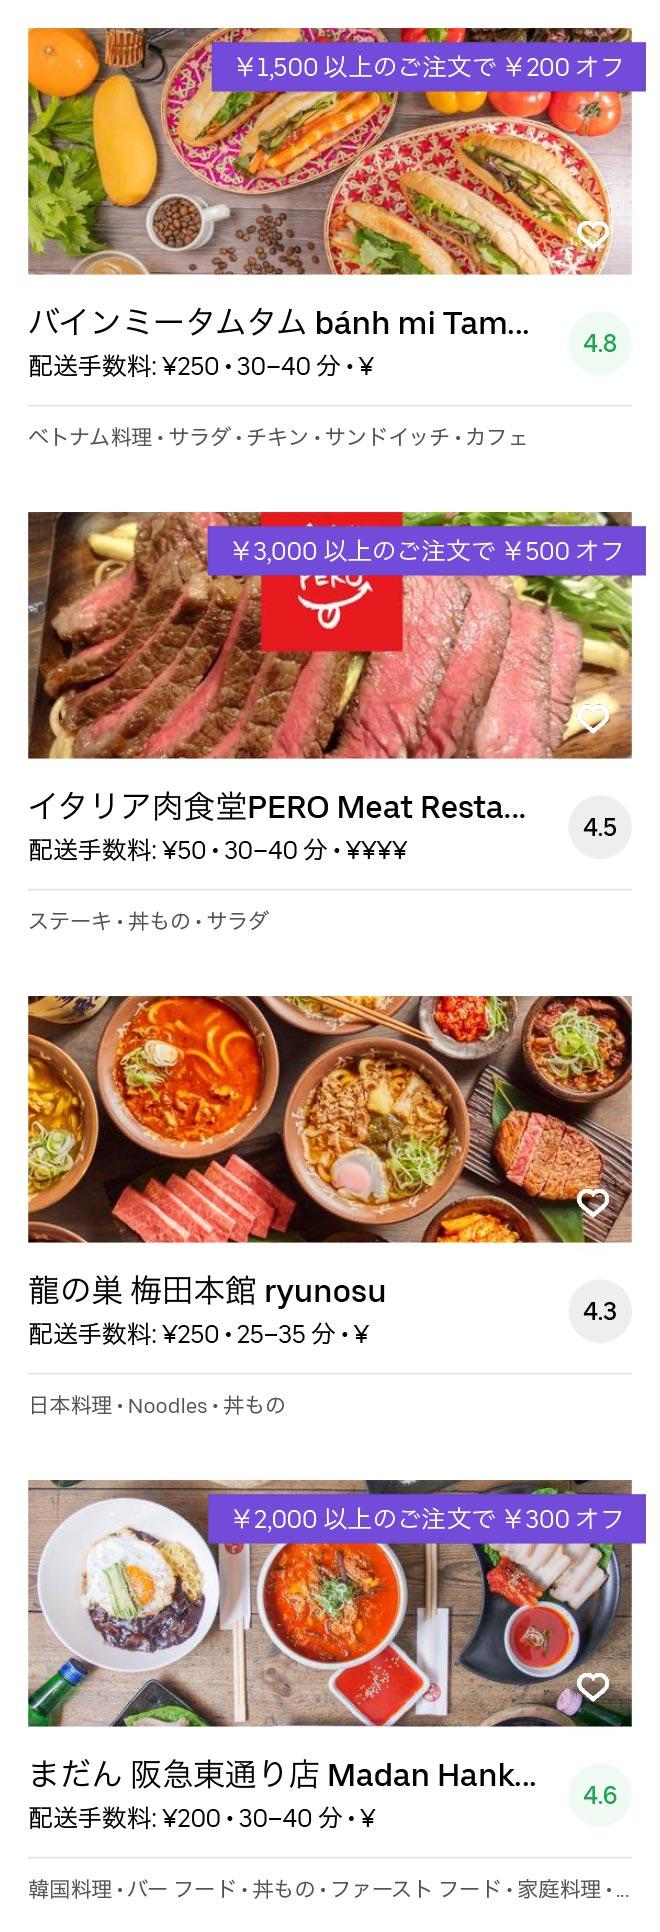 Osaka kyobashi menu 2005 03